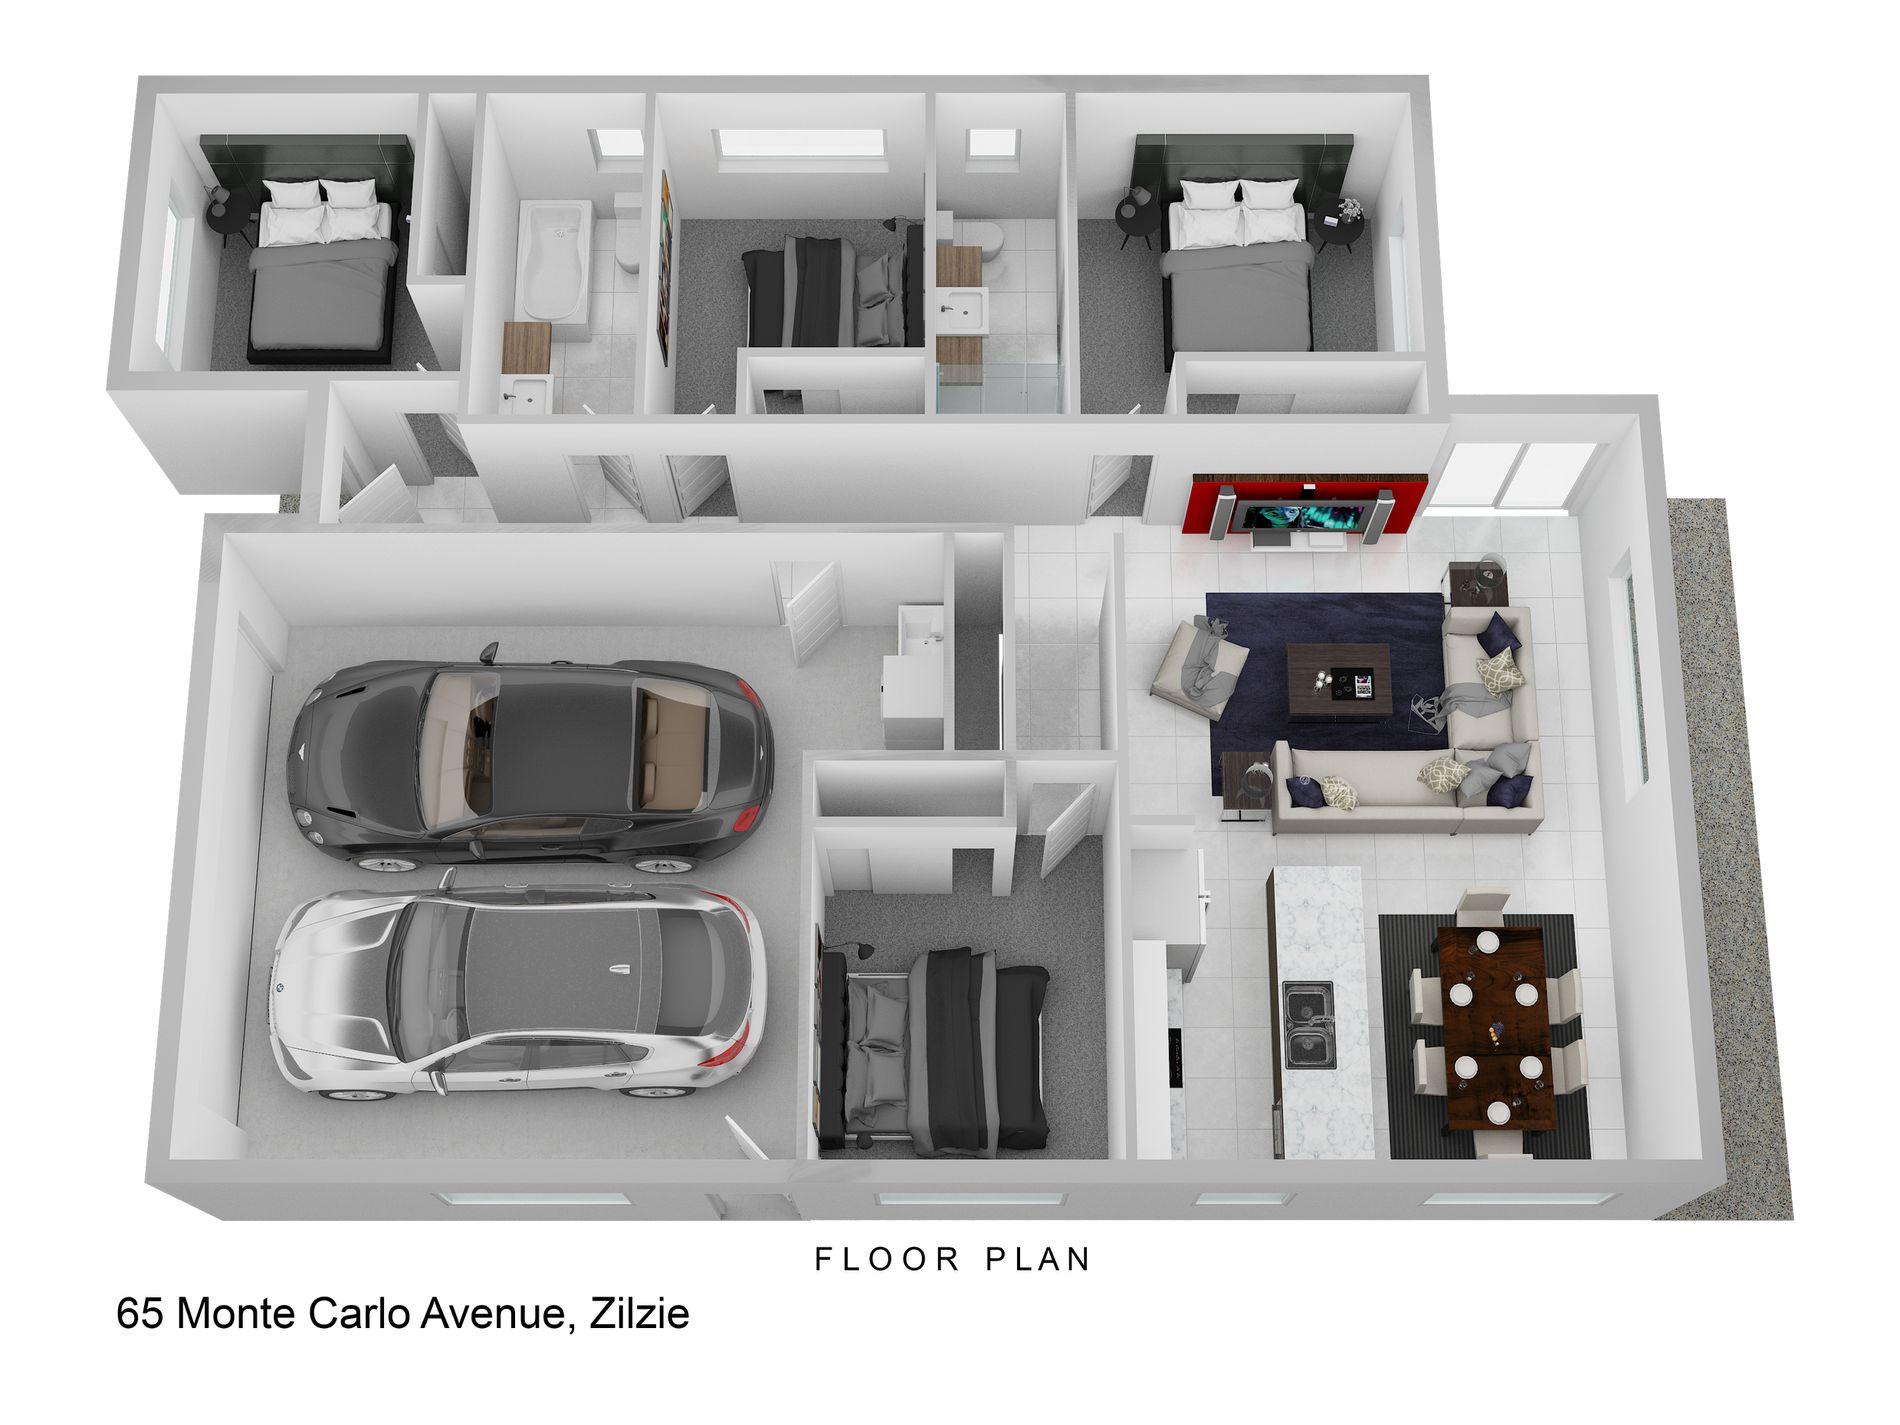 65 Monte Carlo Avenue, Zilzie